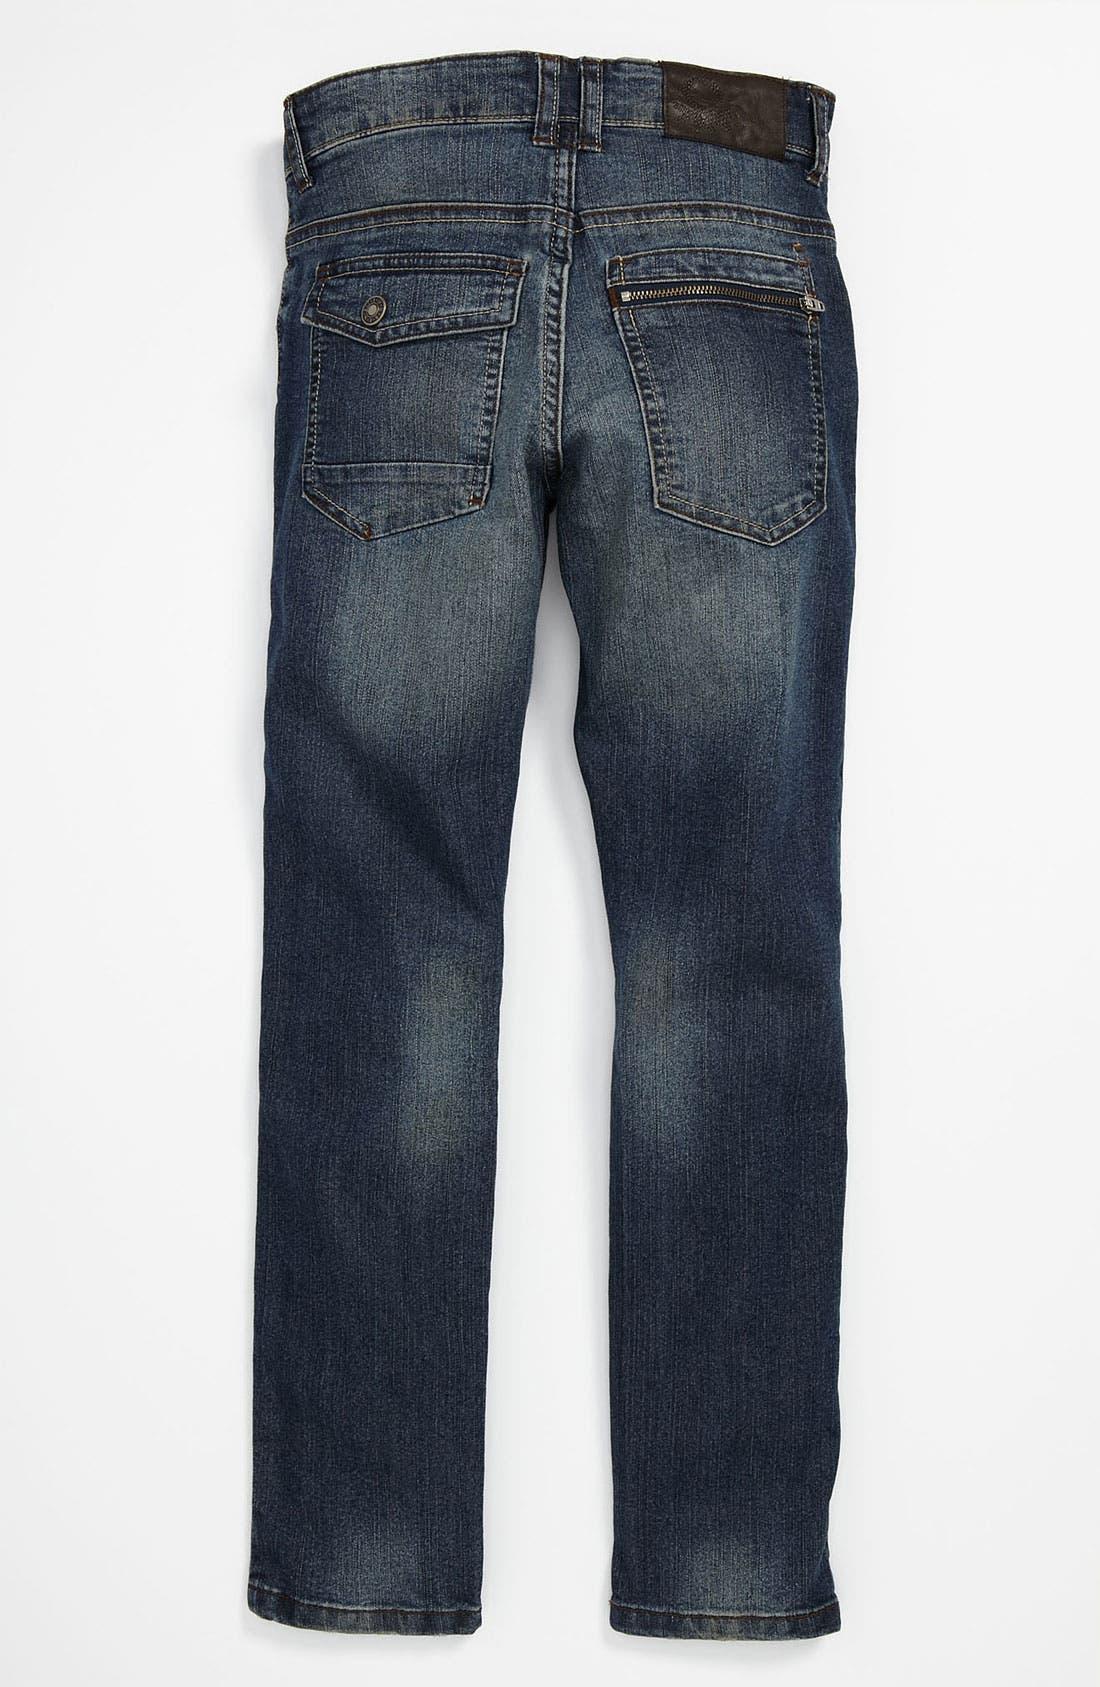 Main Image - United Colors of Benetton Kids Skinny Leg Jeans (Little Boys & Big Boys)